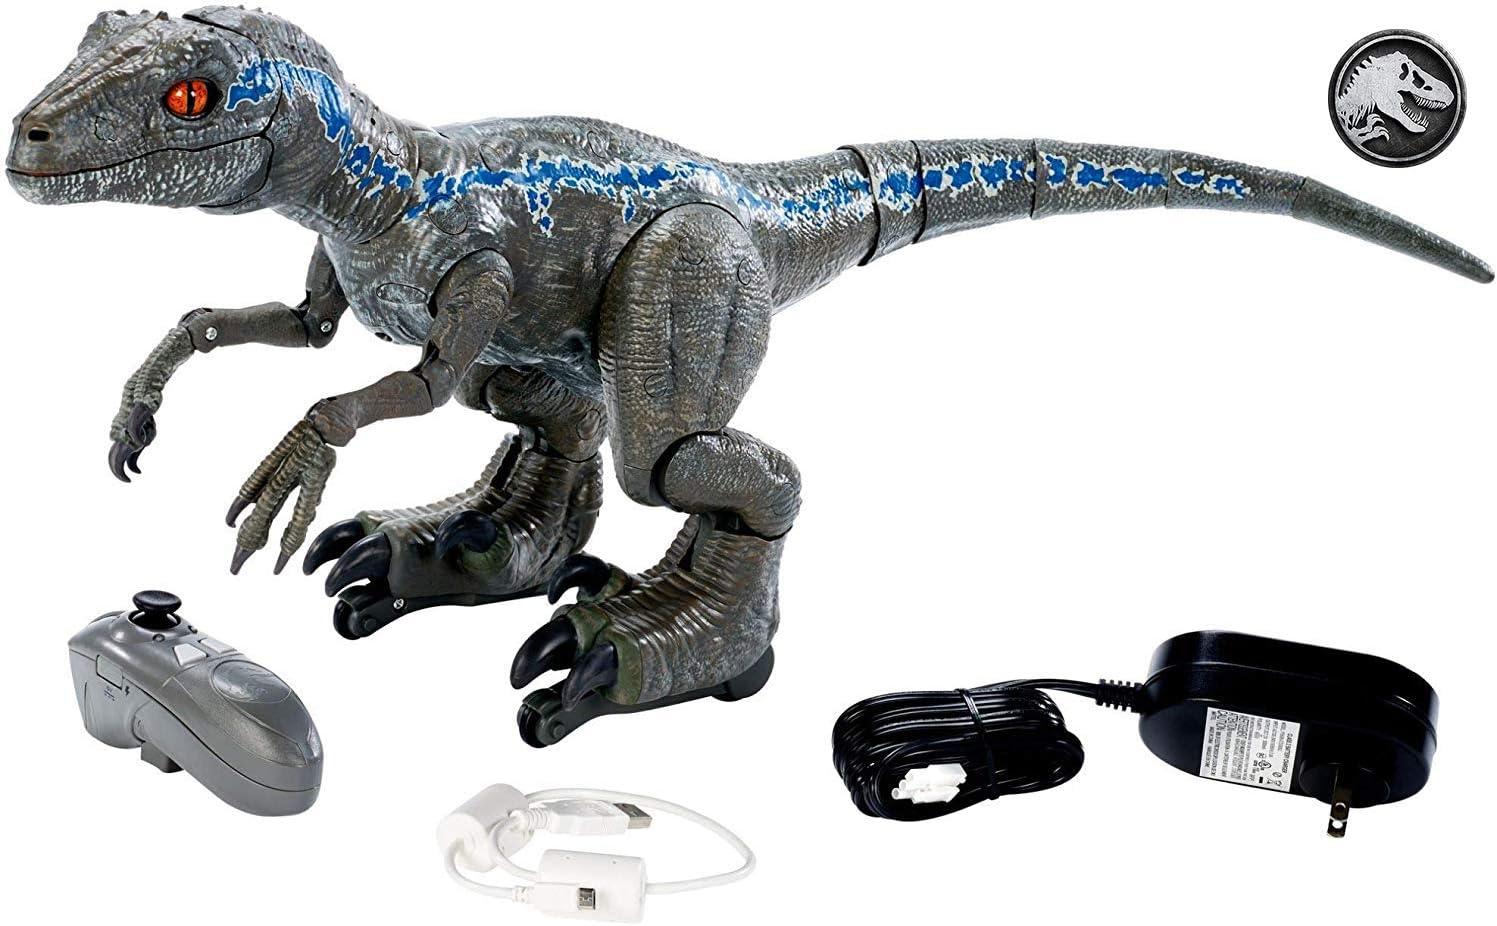 Jurassic World Figura Alpha entrenando al dinosaurio de juguete ...